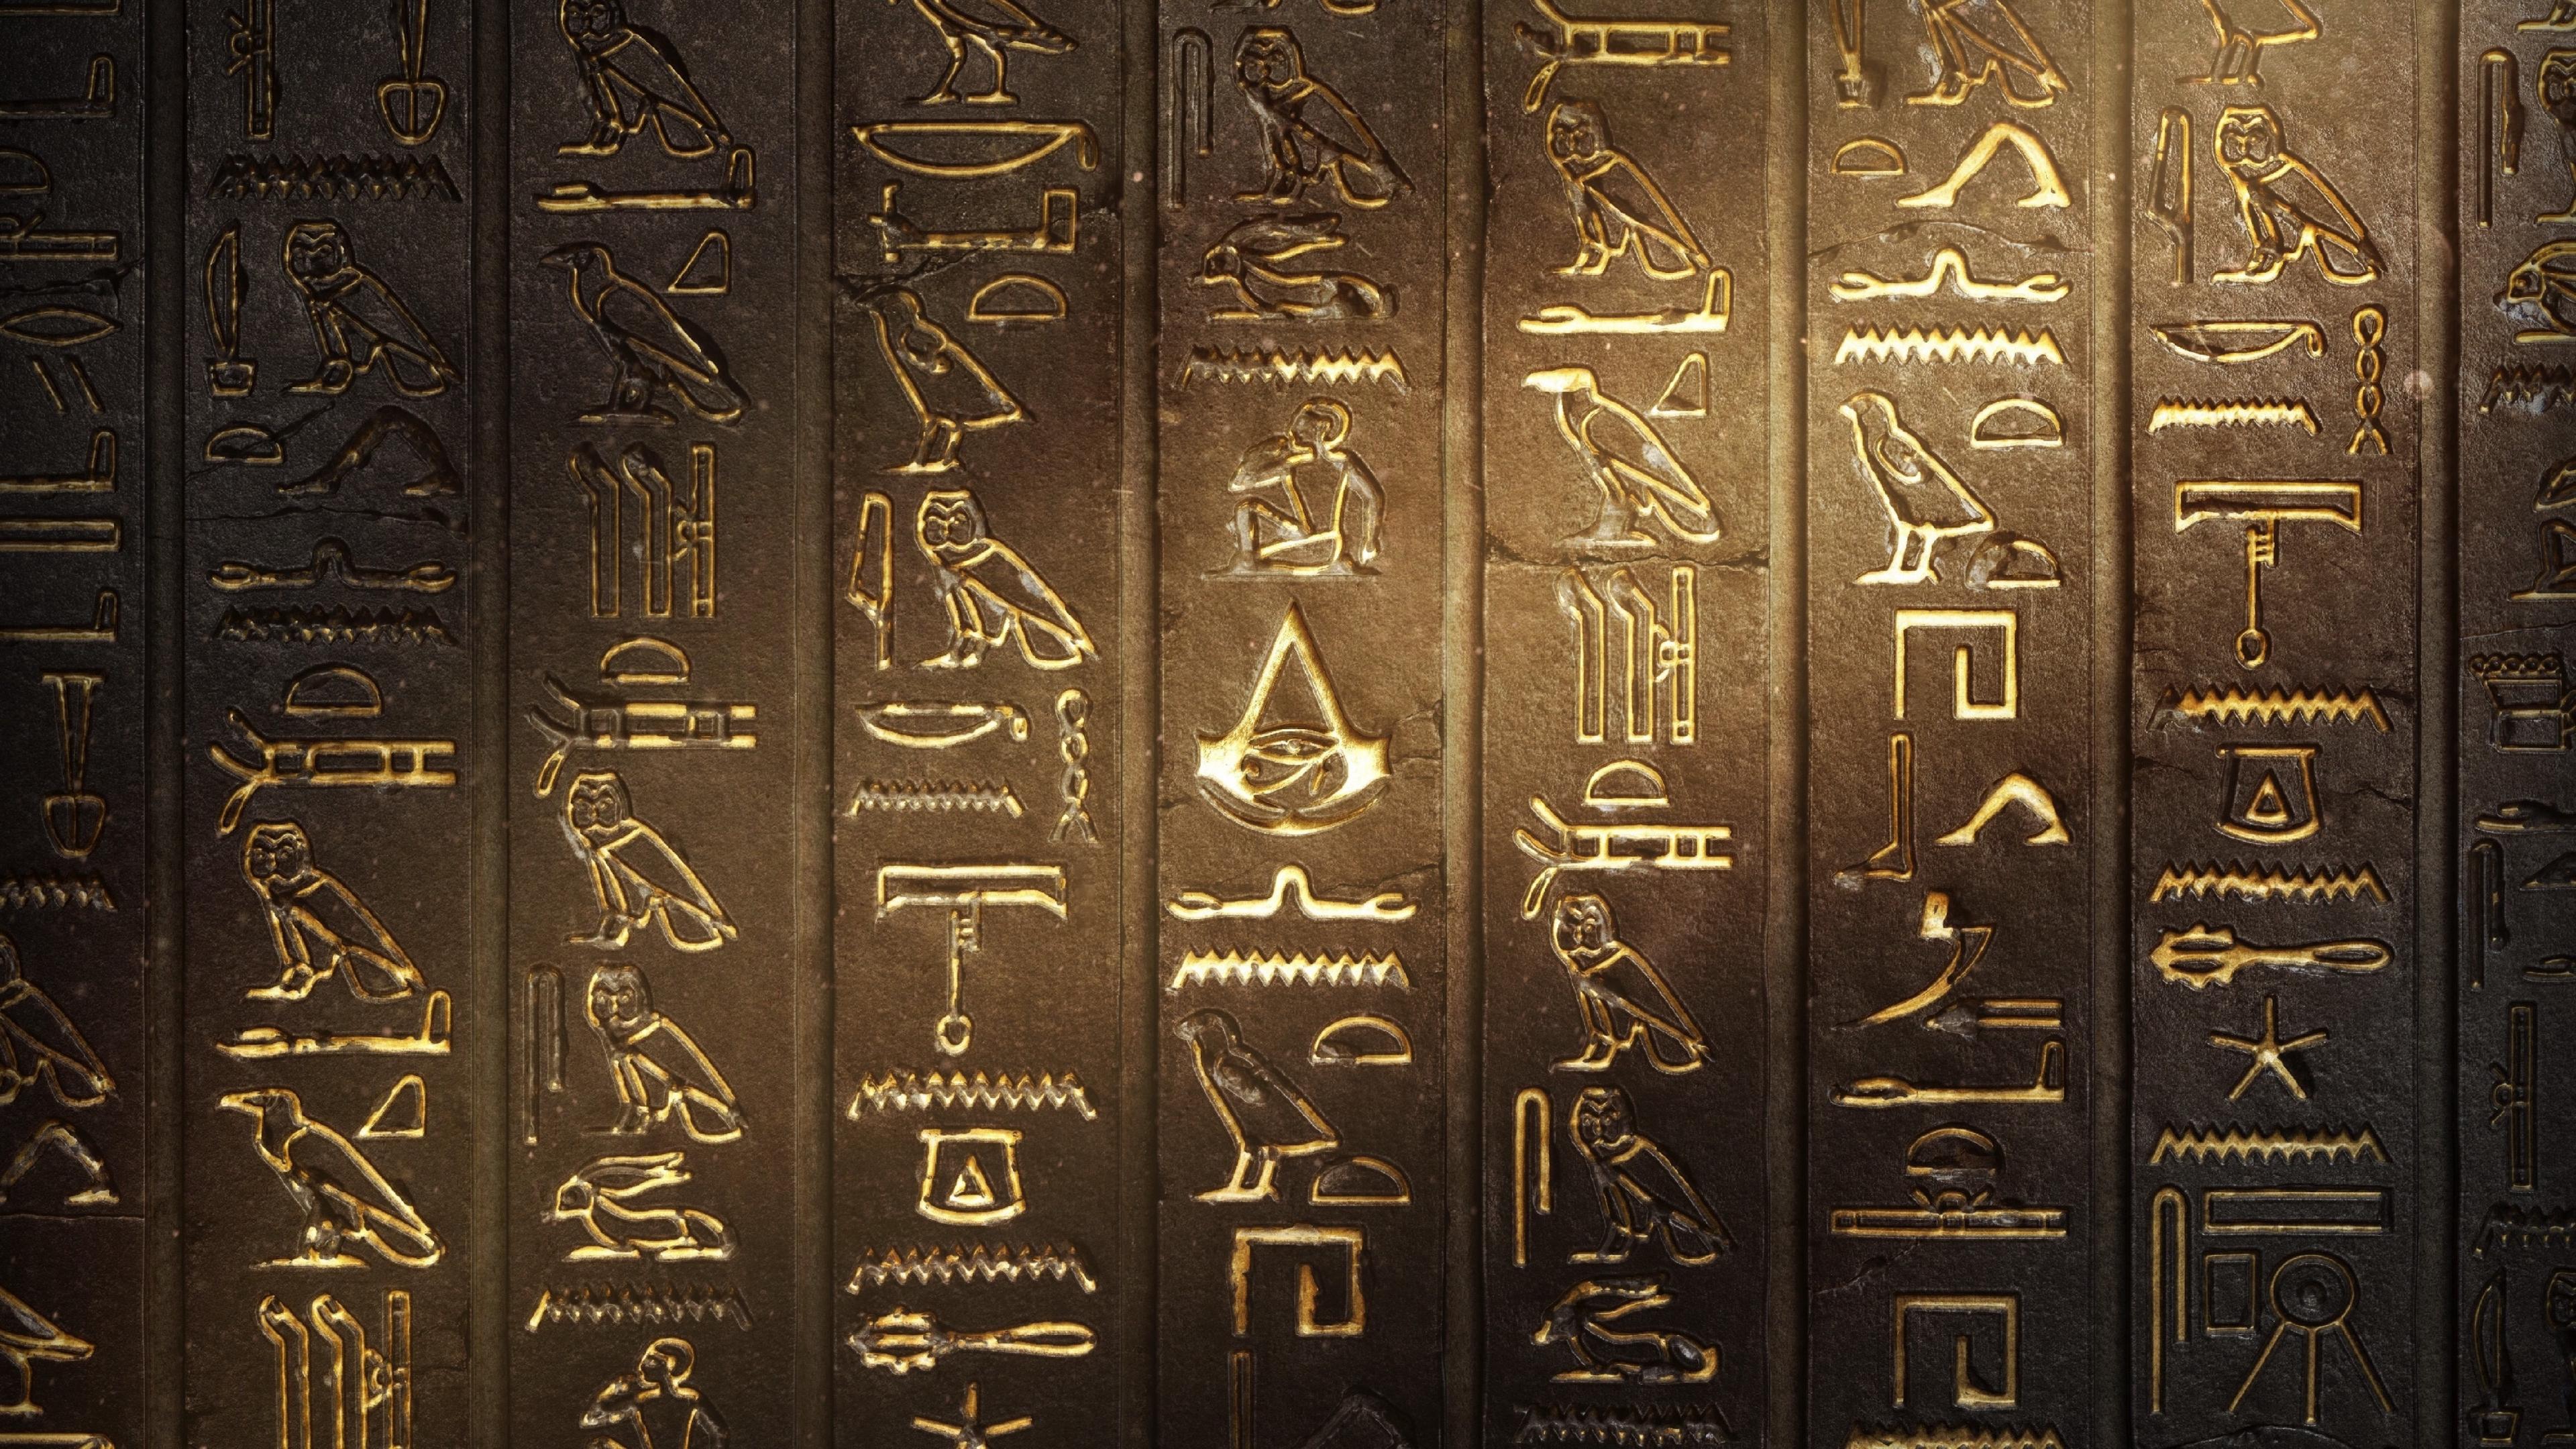 Download 3840x2160 Wallpaper Assassin S Creed Origins Video Game